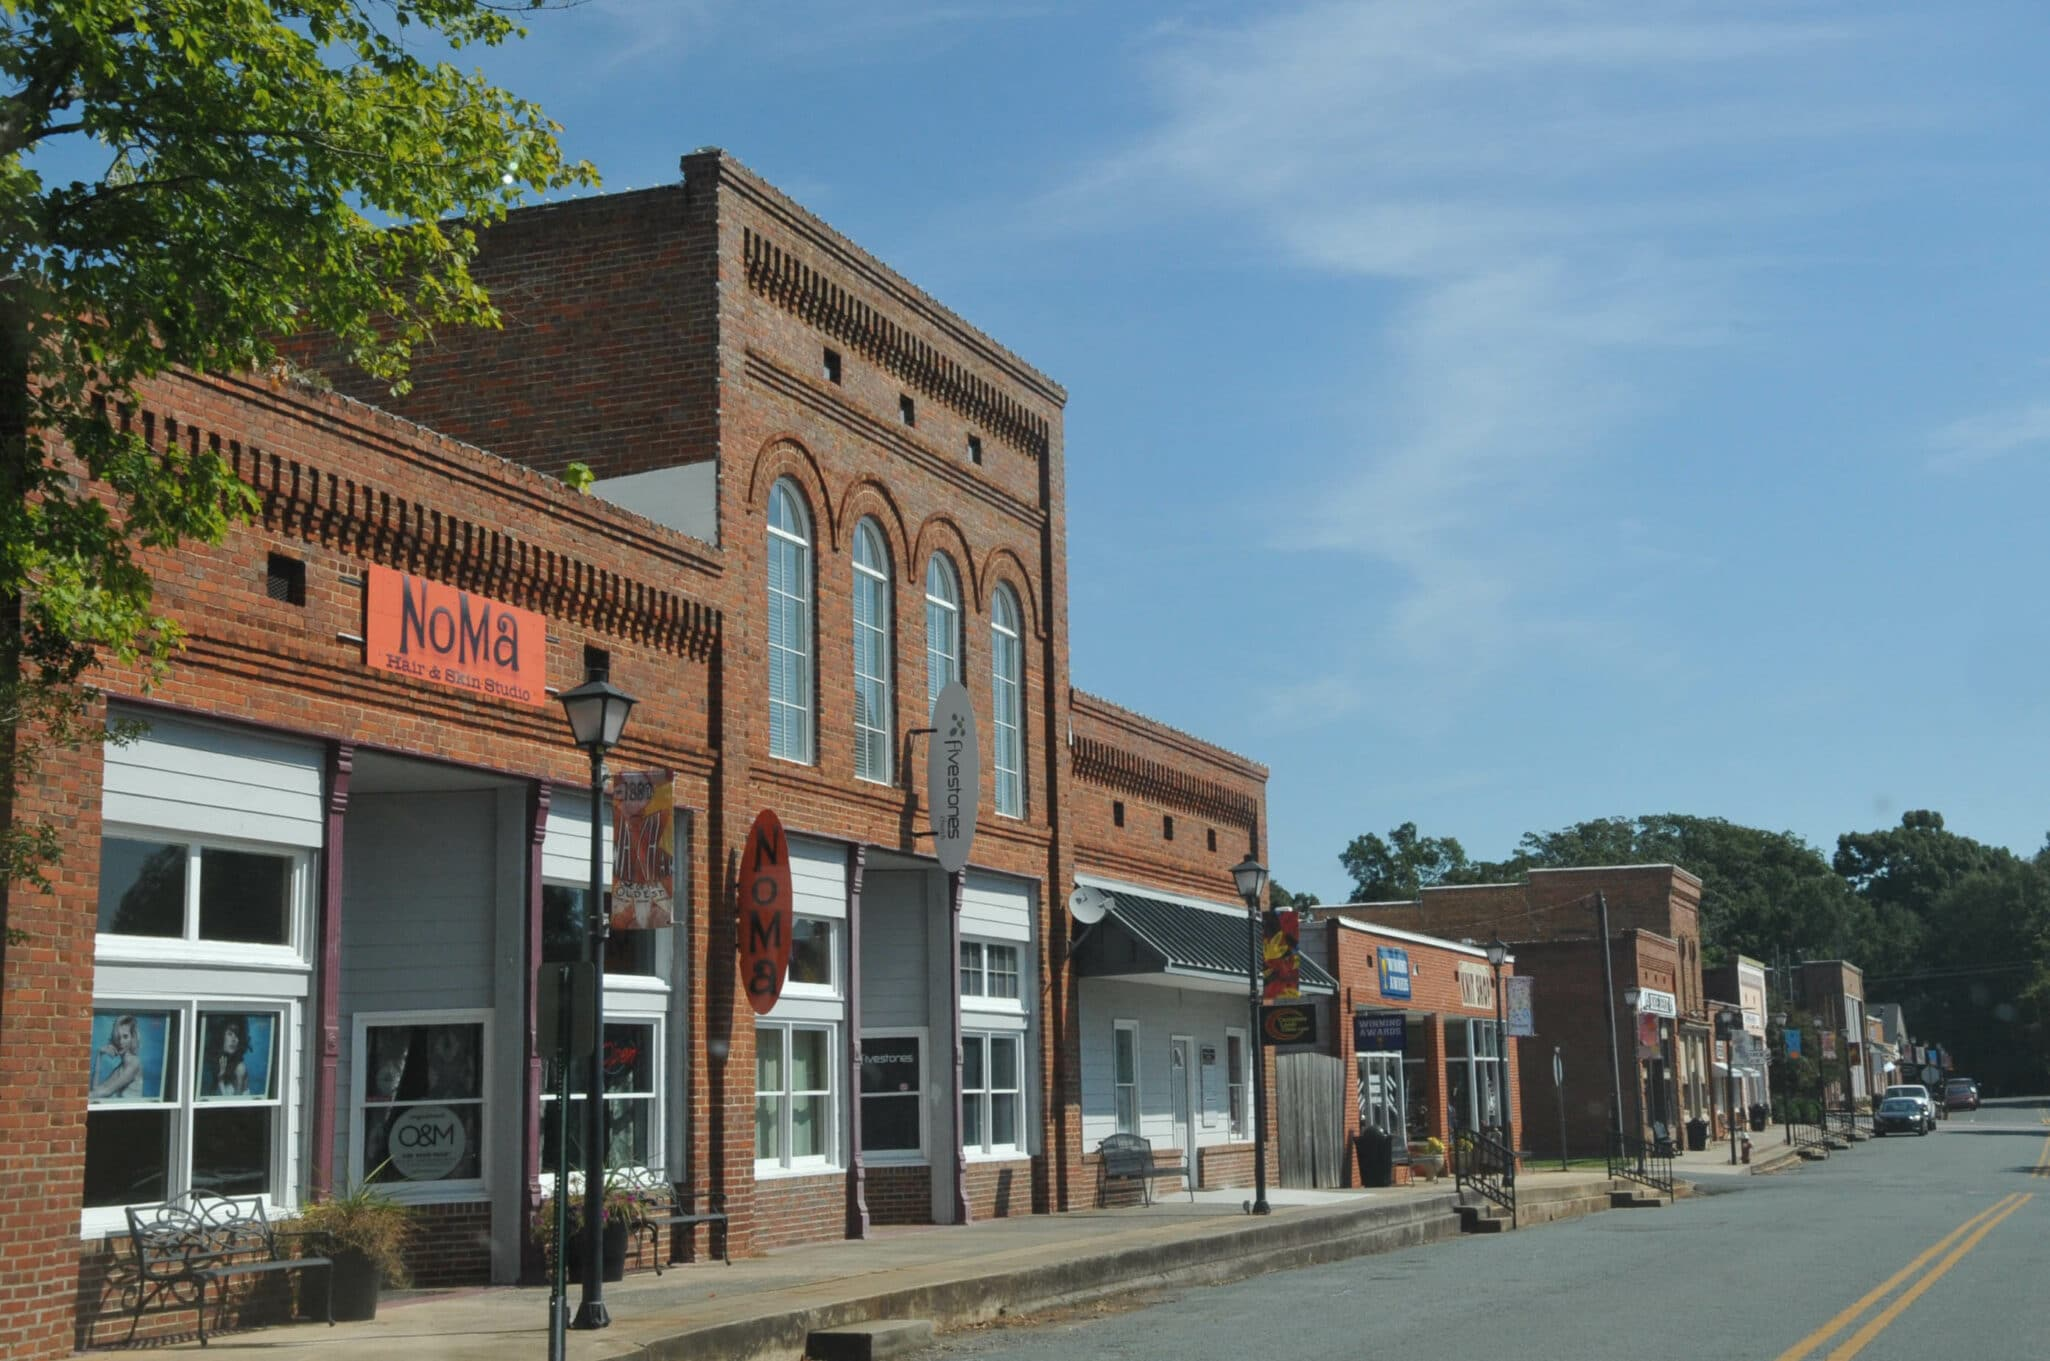 Waxhaw Historic District, Union County, NC